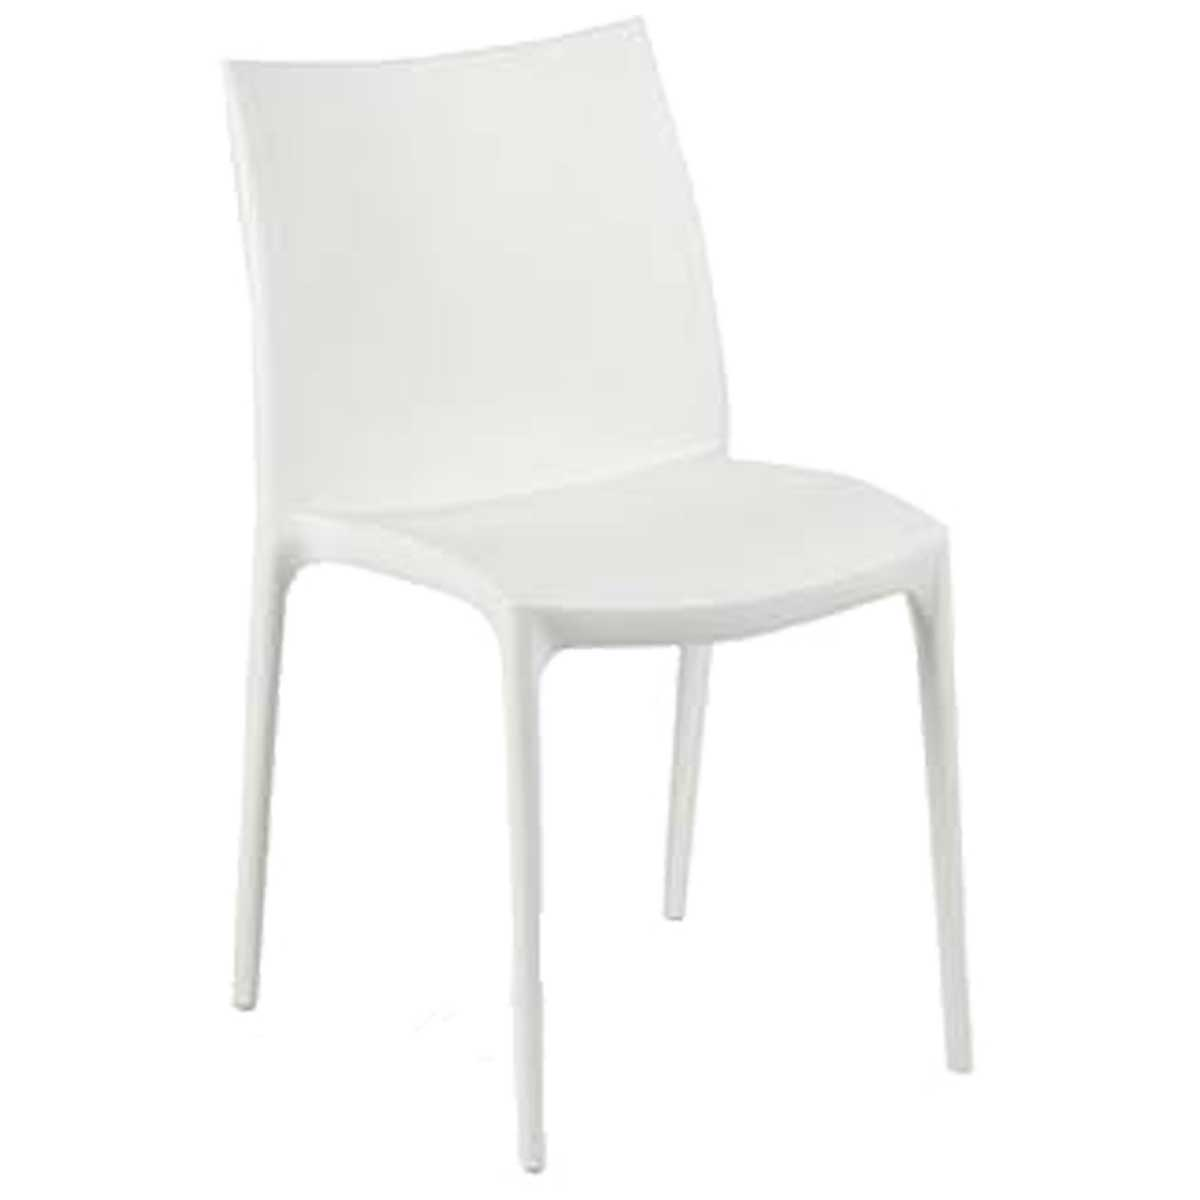 kromy c blanc 01 - https://www.werzalit.com/es/producto/kromy-stuhl/